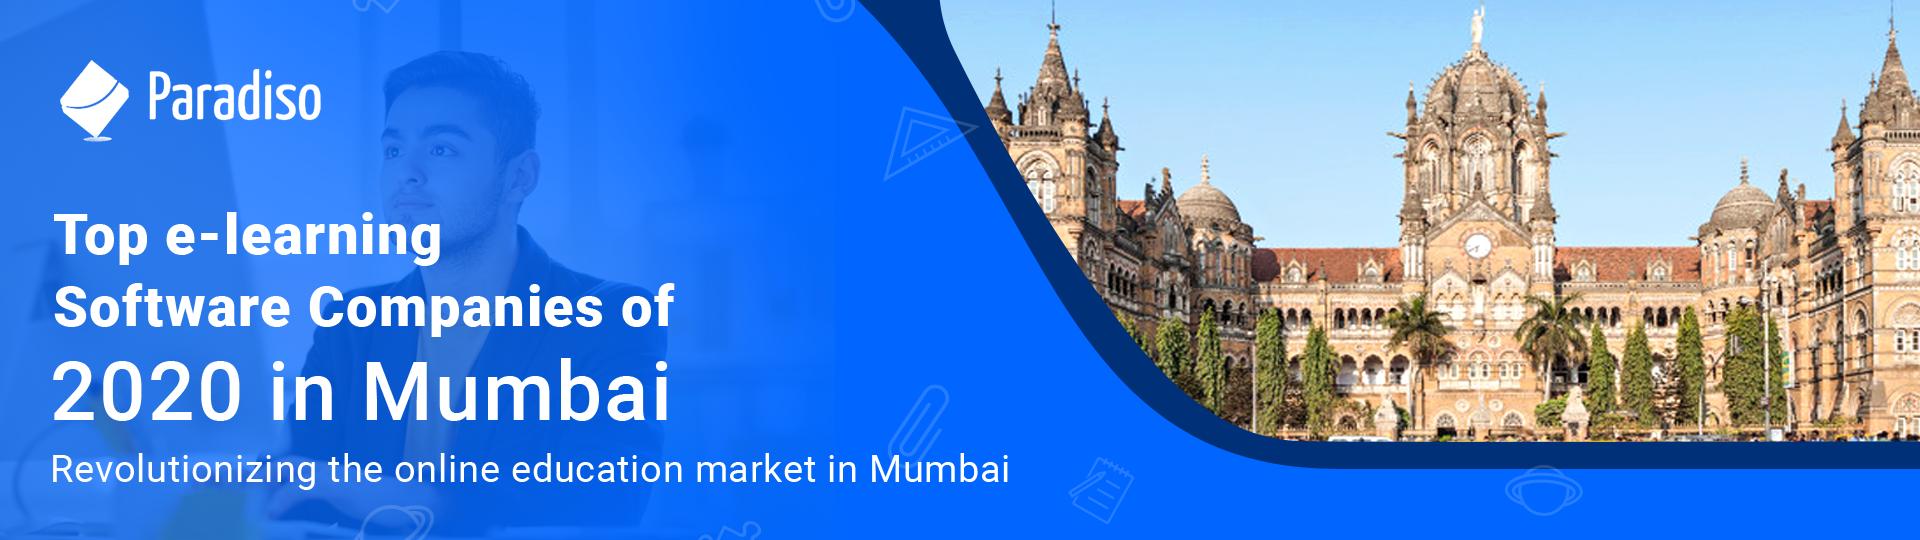 Top e-learning software companies in Mumbai_Blog Banner